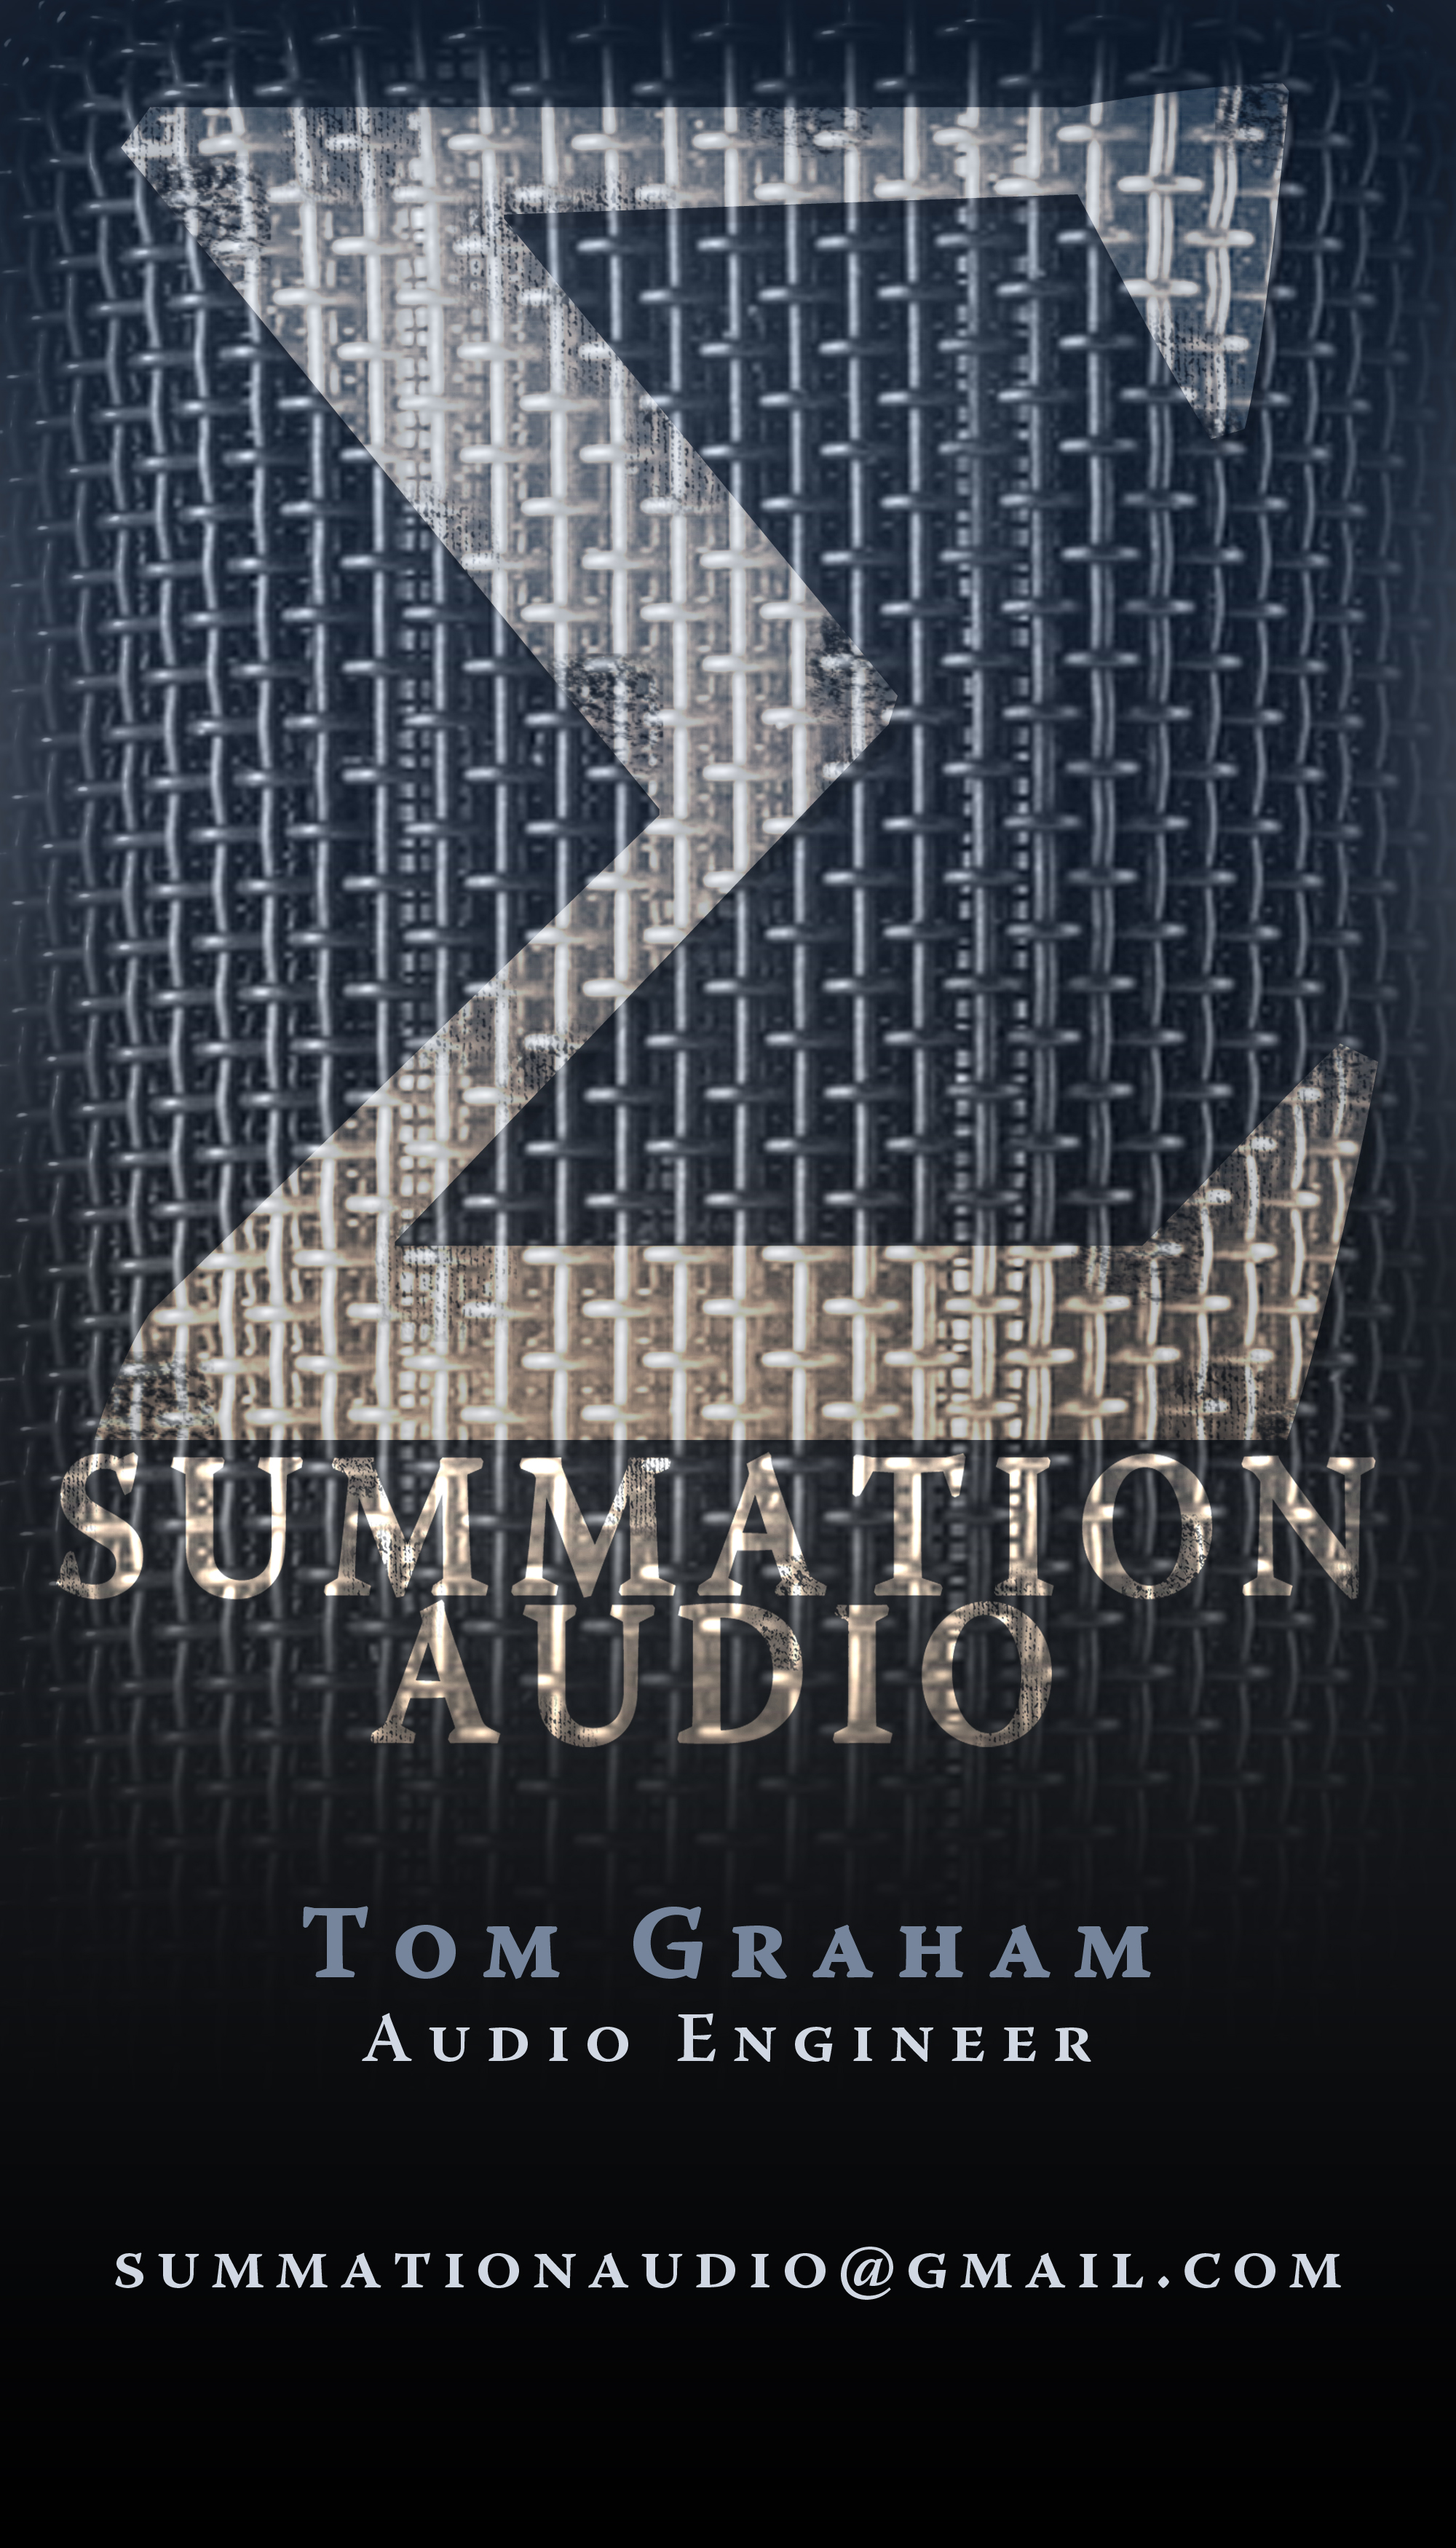 Summation Audio - Business Card